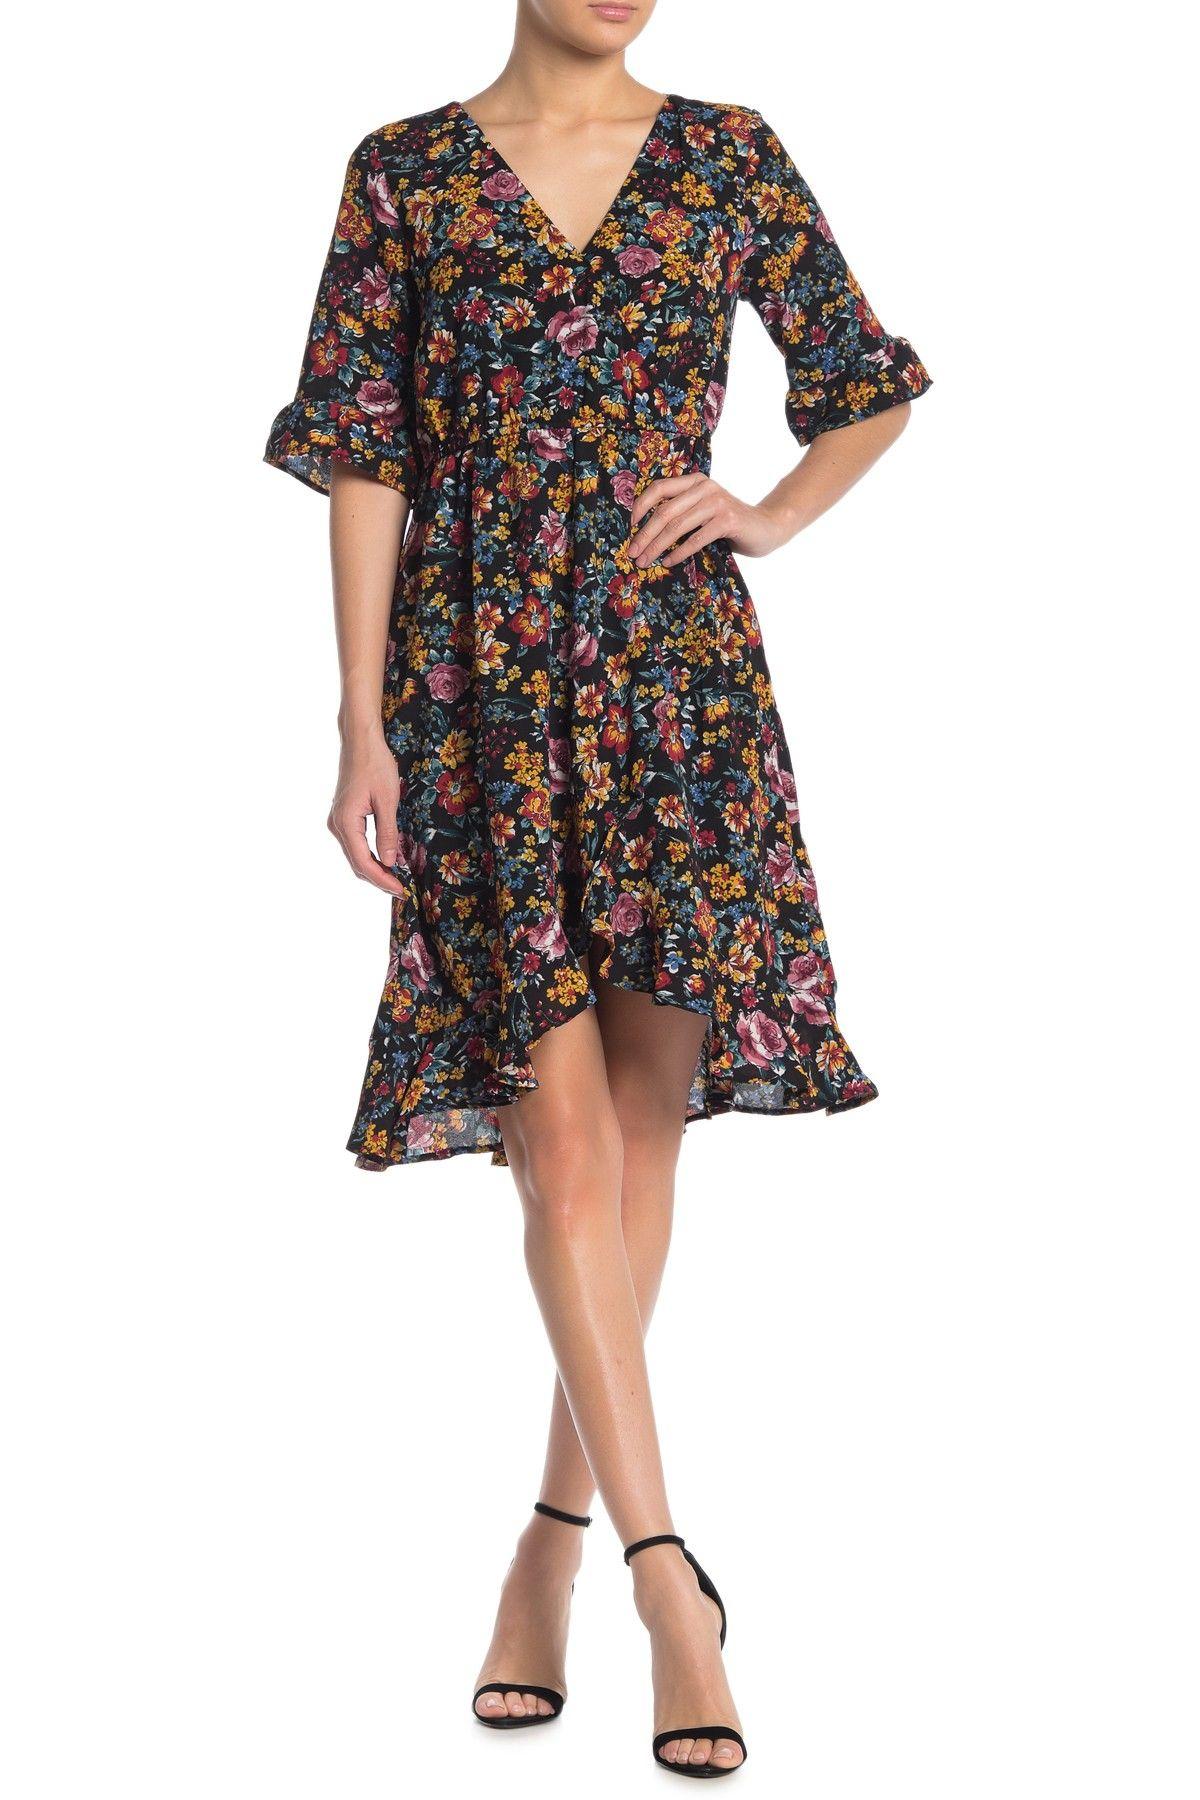 Bobeau Ruffle High Low Faux Wrap Dress Nordstrom Rack Wrap Dress Wrap Midi Dress Dresses [ 1800 x 1200 Pixel ]